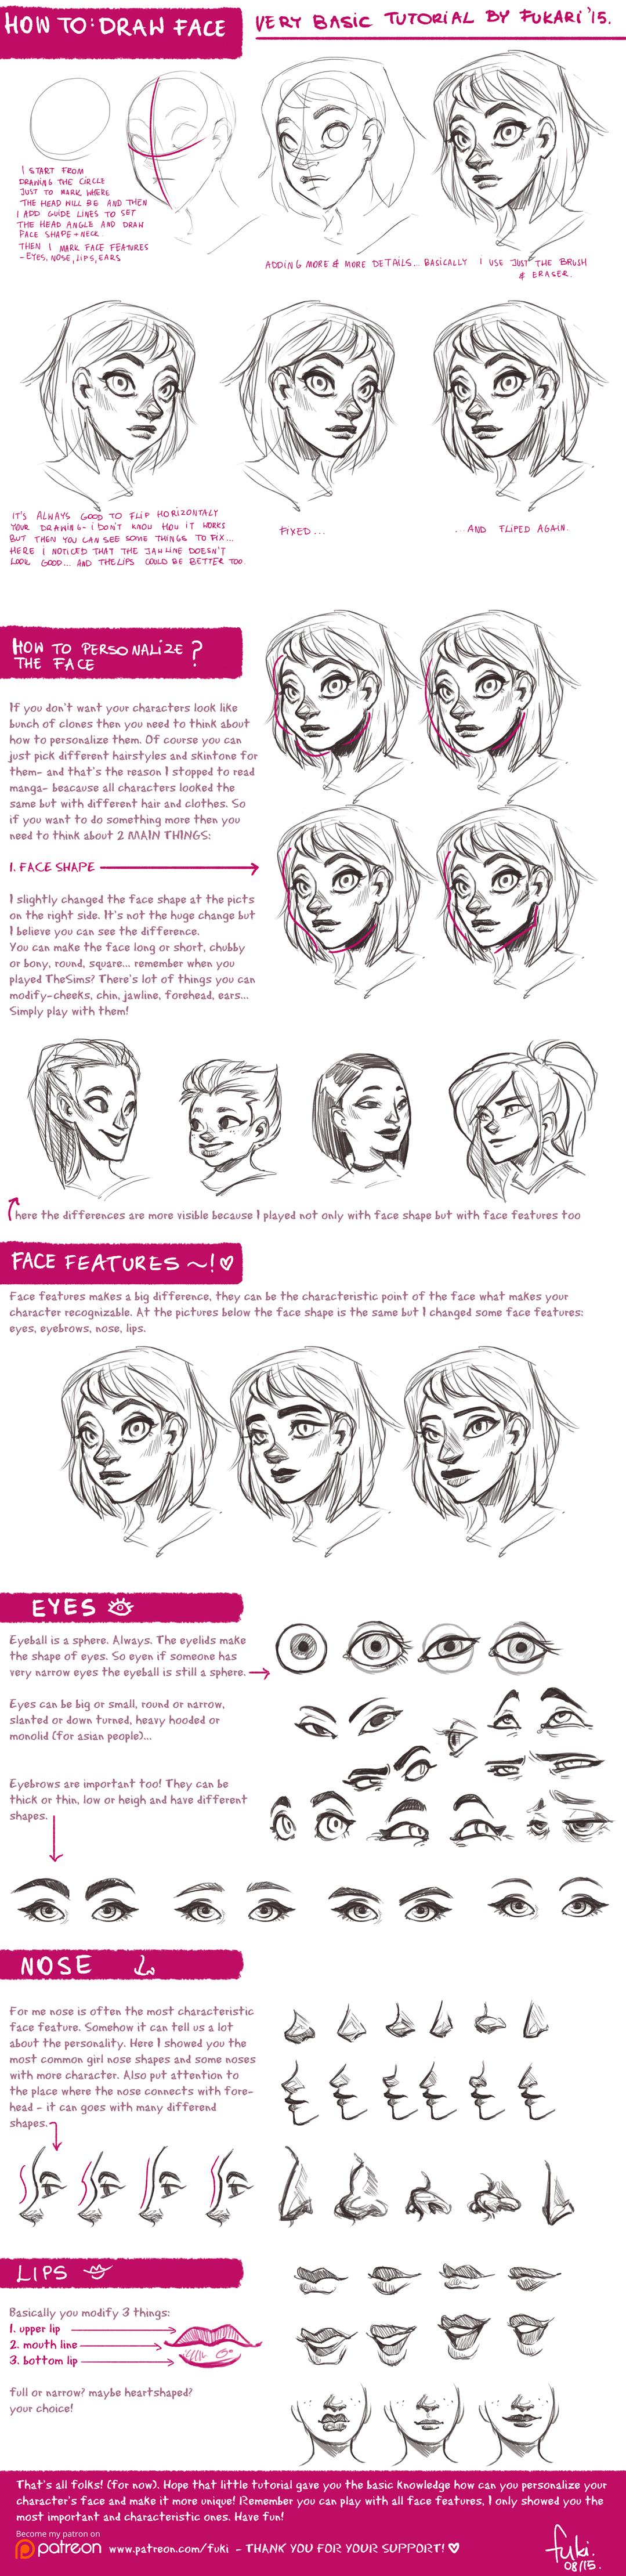 face tutorial by Fukari